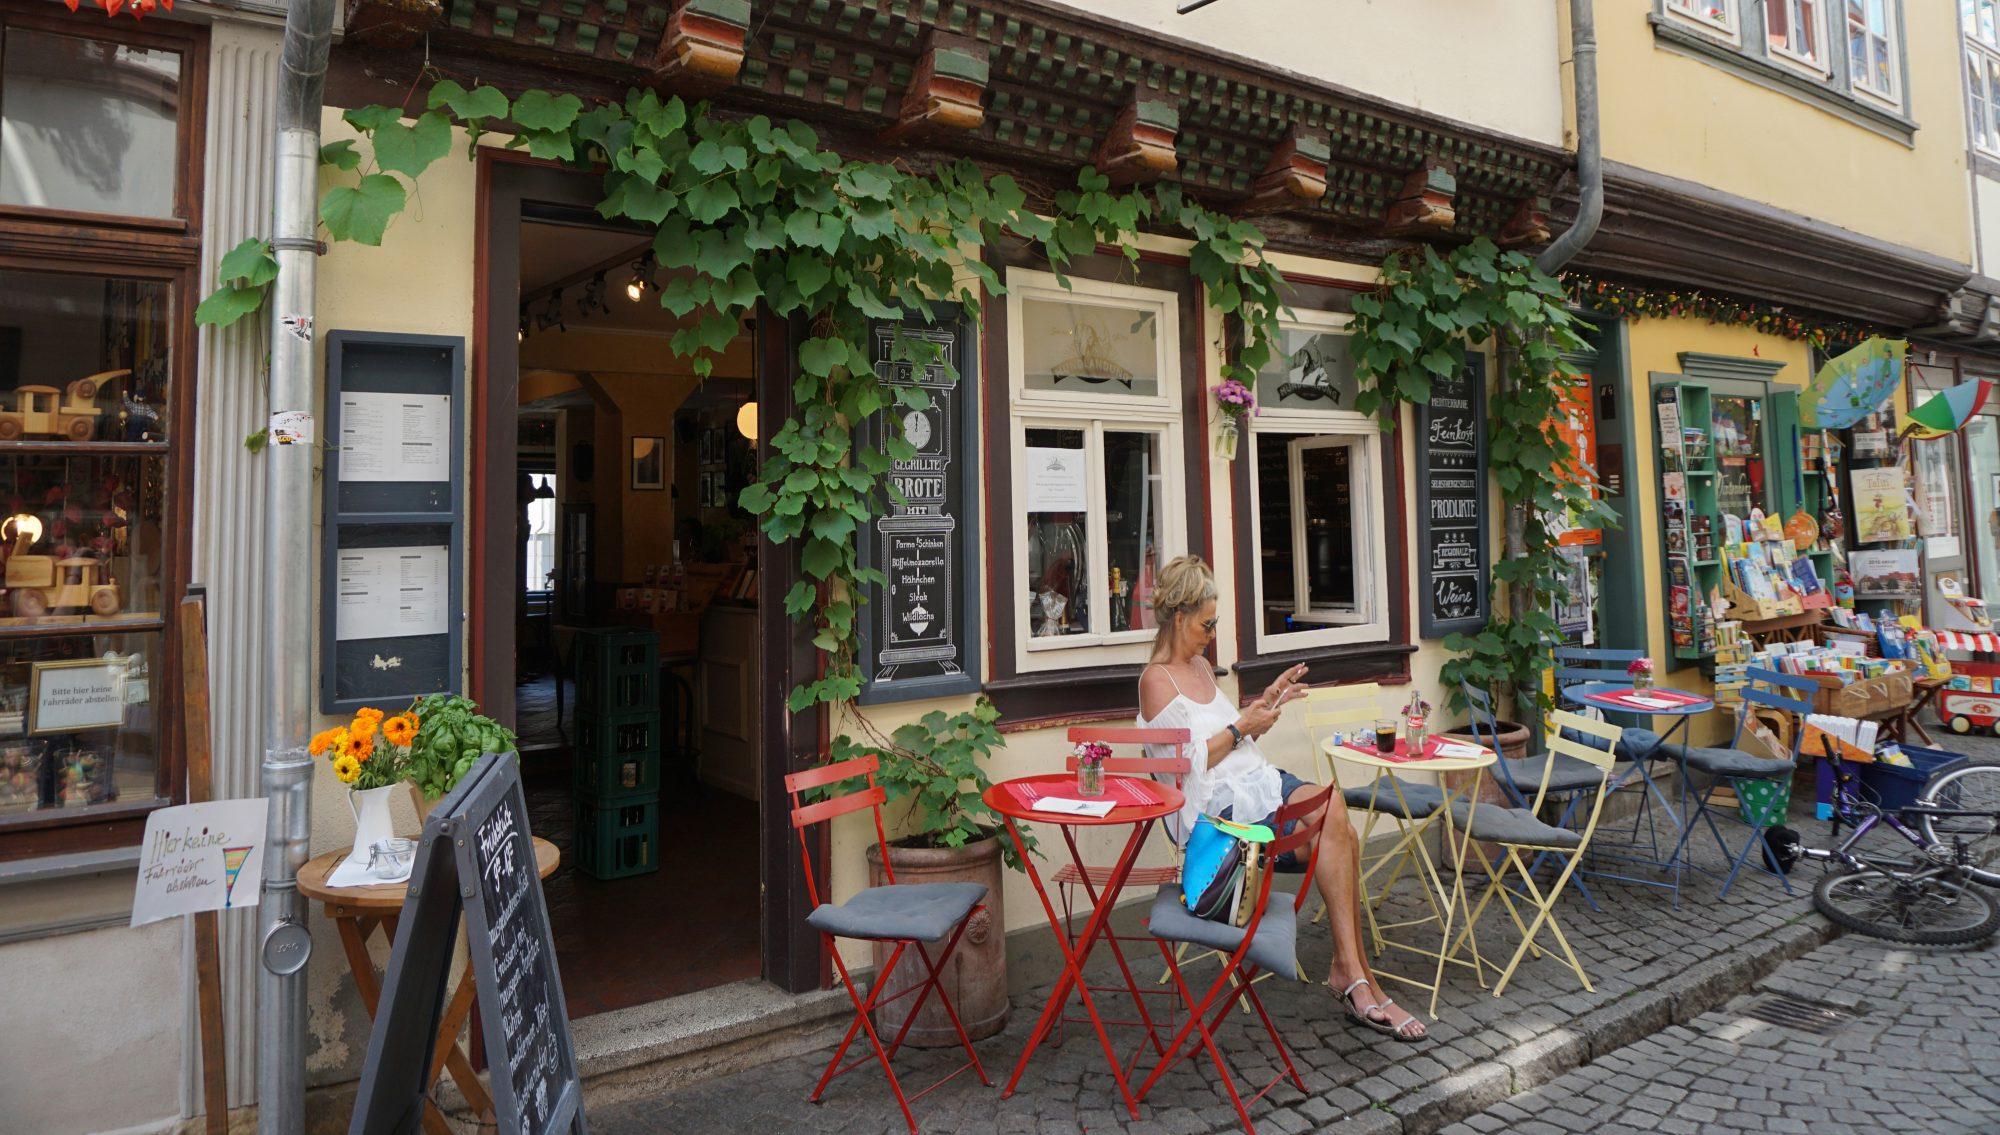 Erfurt. Encanto medieval de la capital de Turingia